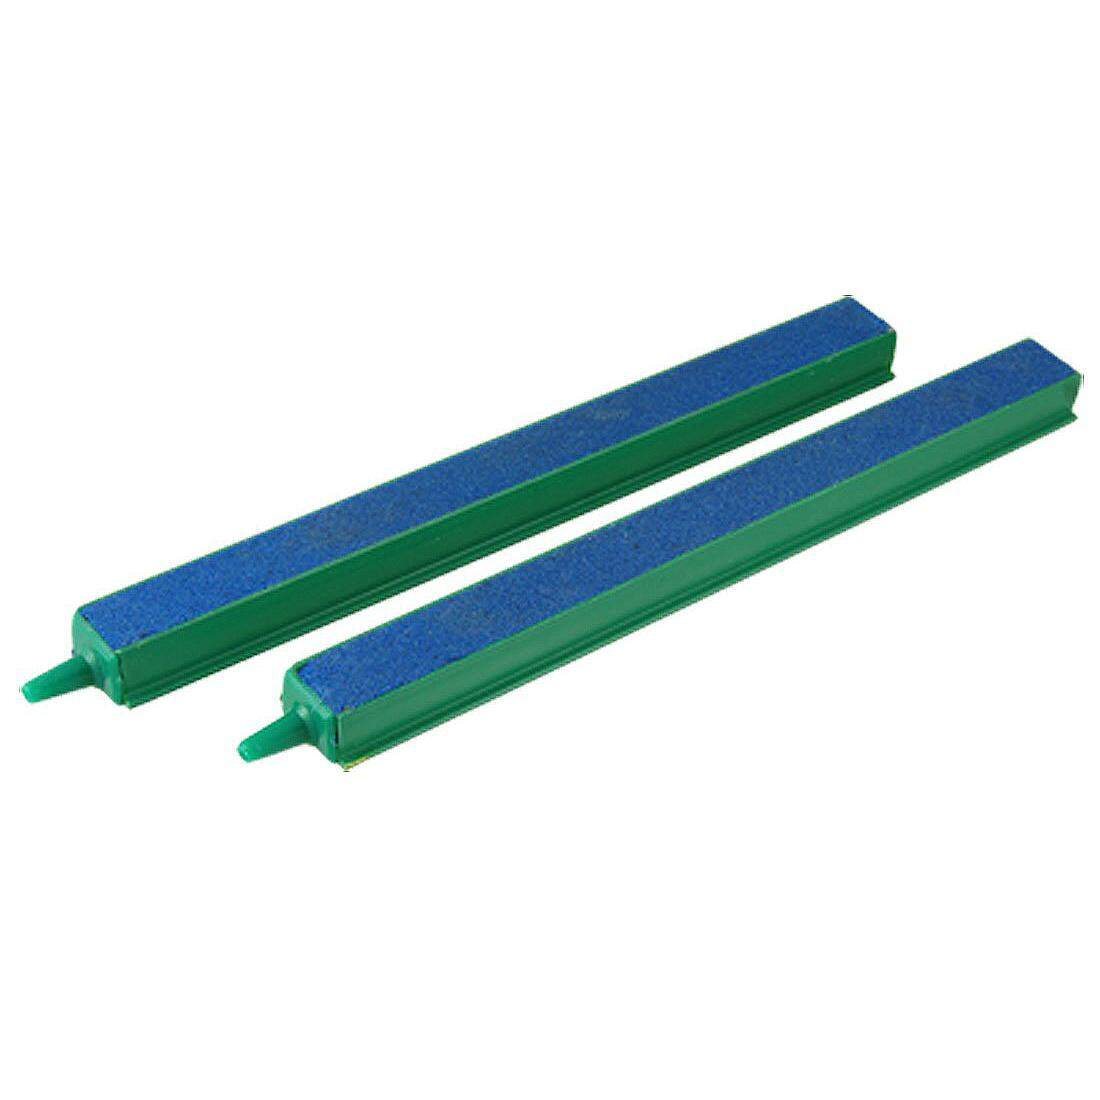 "2 Pcs Fish Tank Air Bubble Airstone Bar 8"" Green Blue"